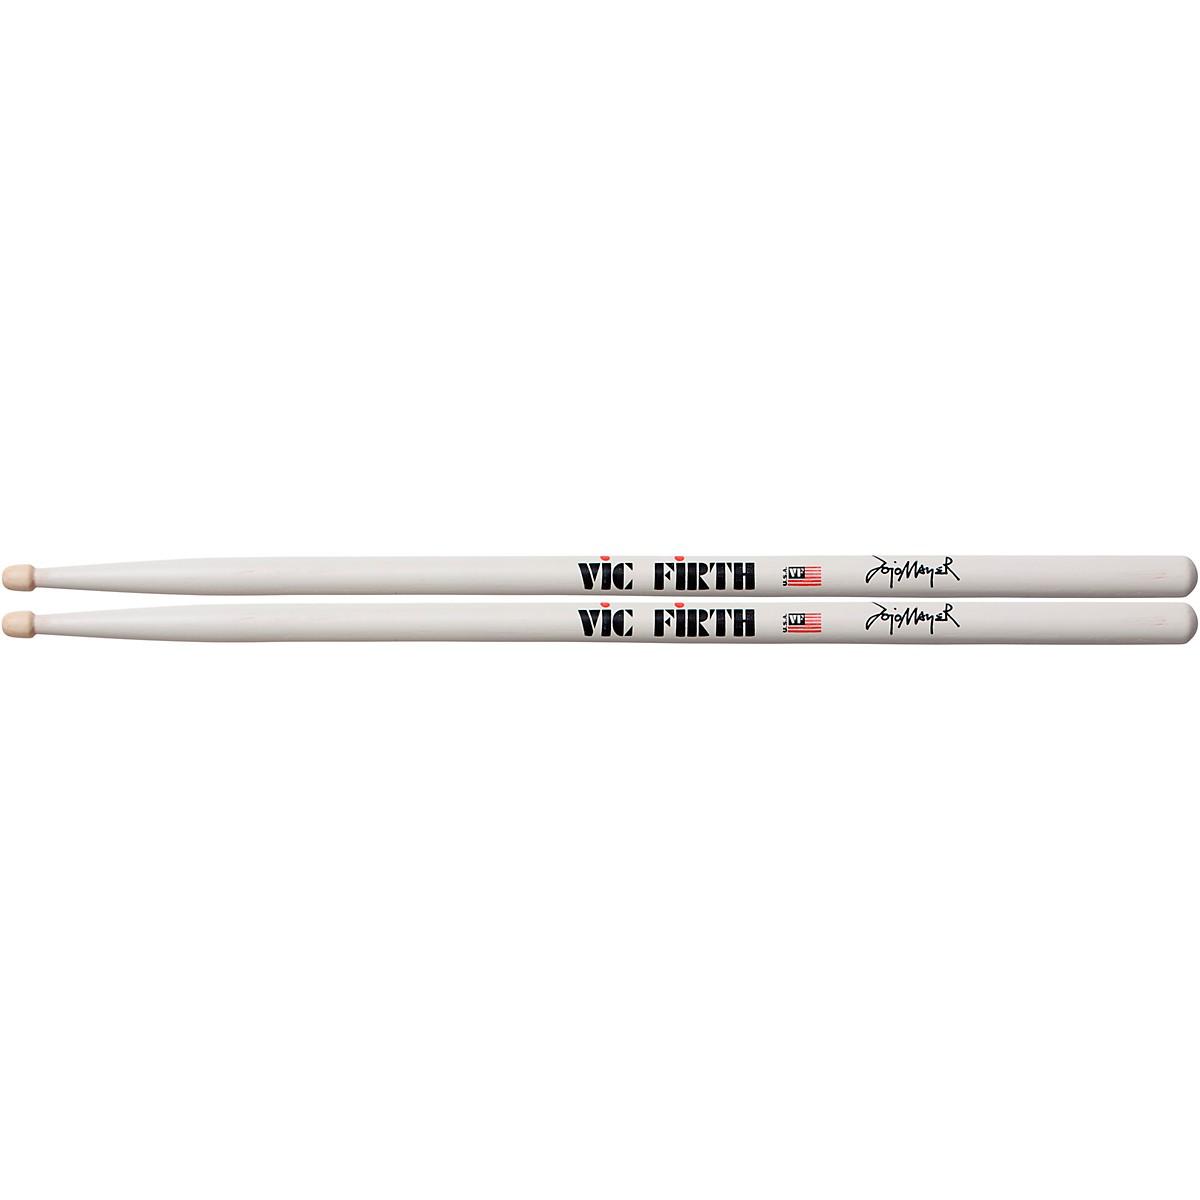 Vic Firth Jojo Mayer Signature Drum Sticks